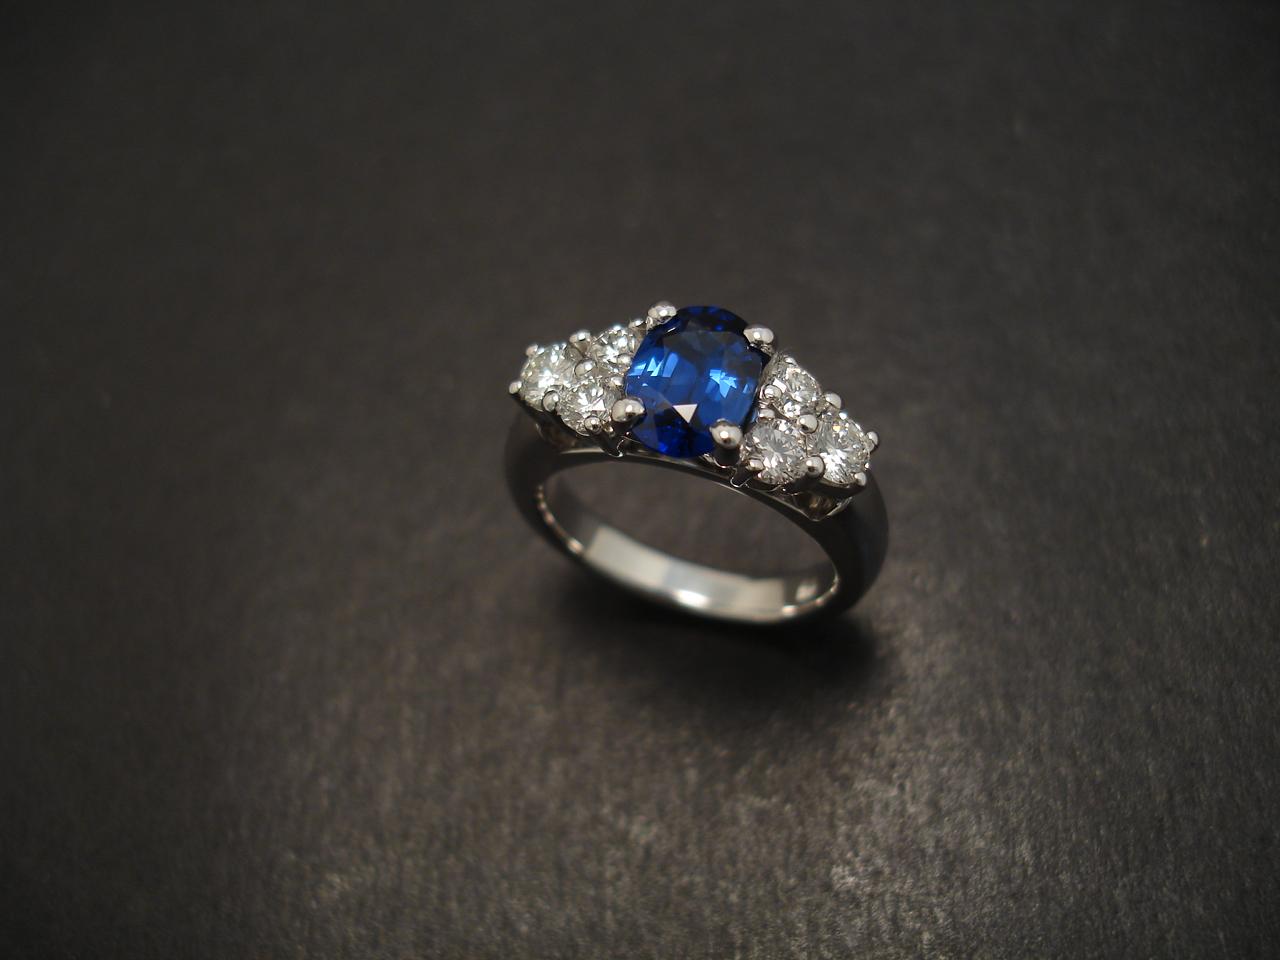 sydney masterwork sapphire engagement ring christopher